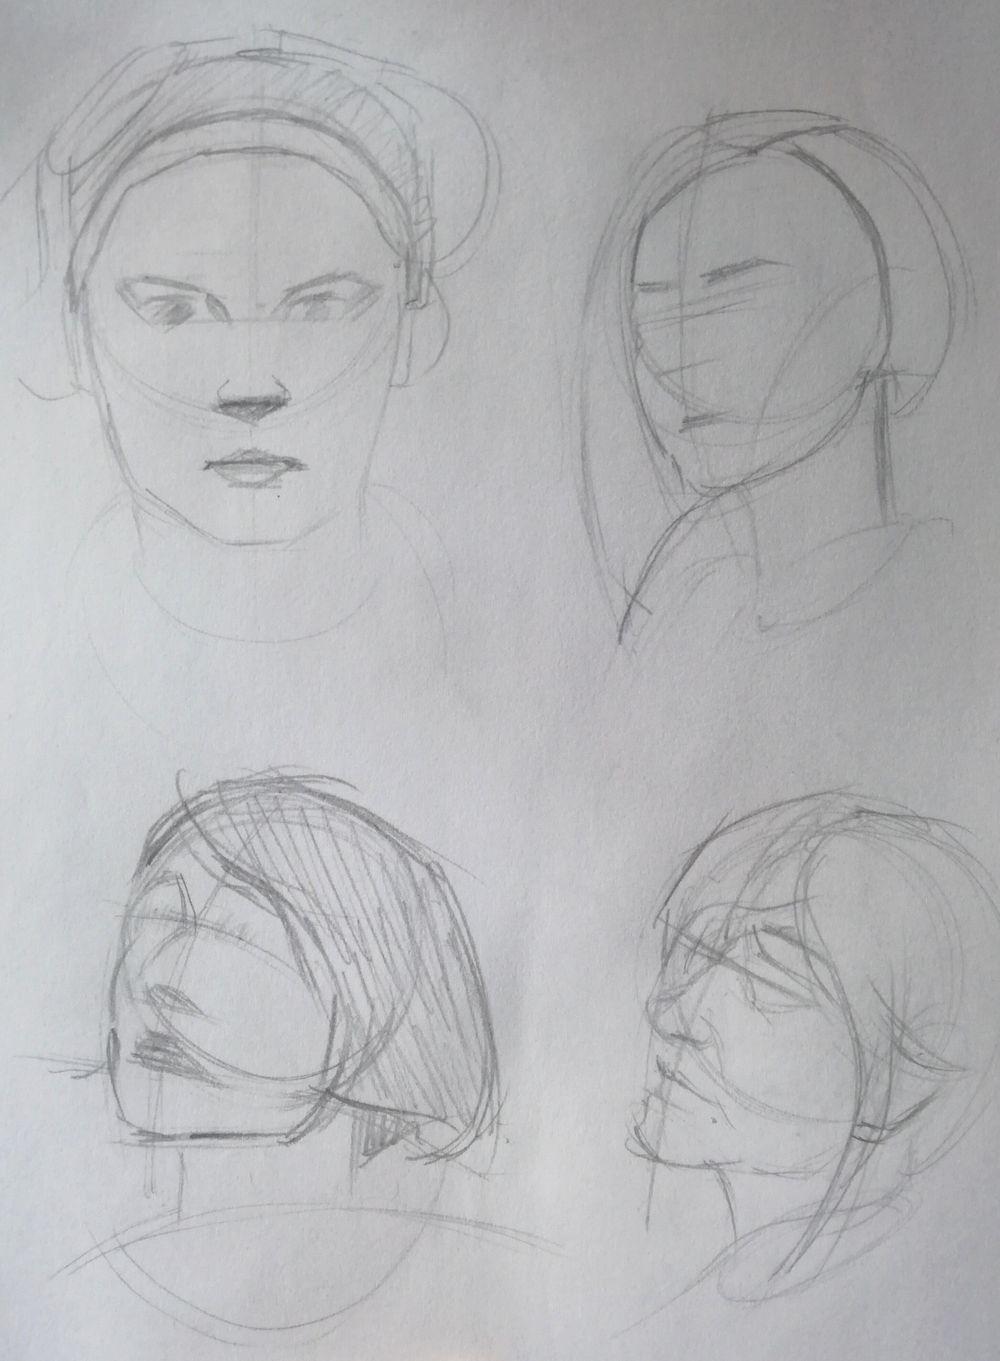 Portraits - image 14 - student project